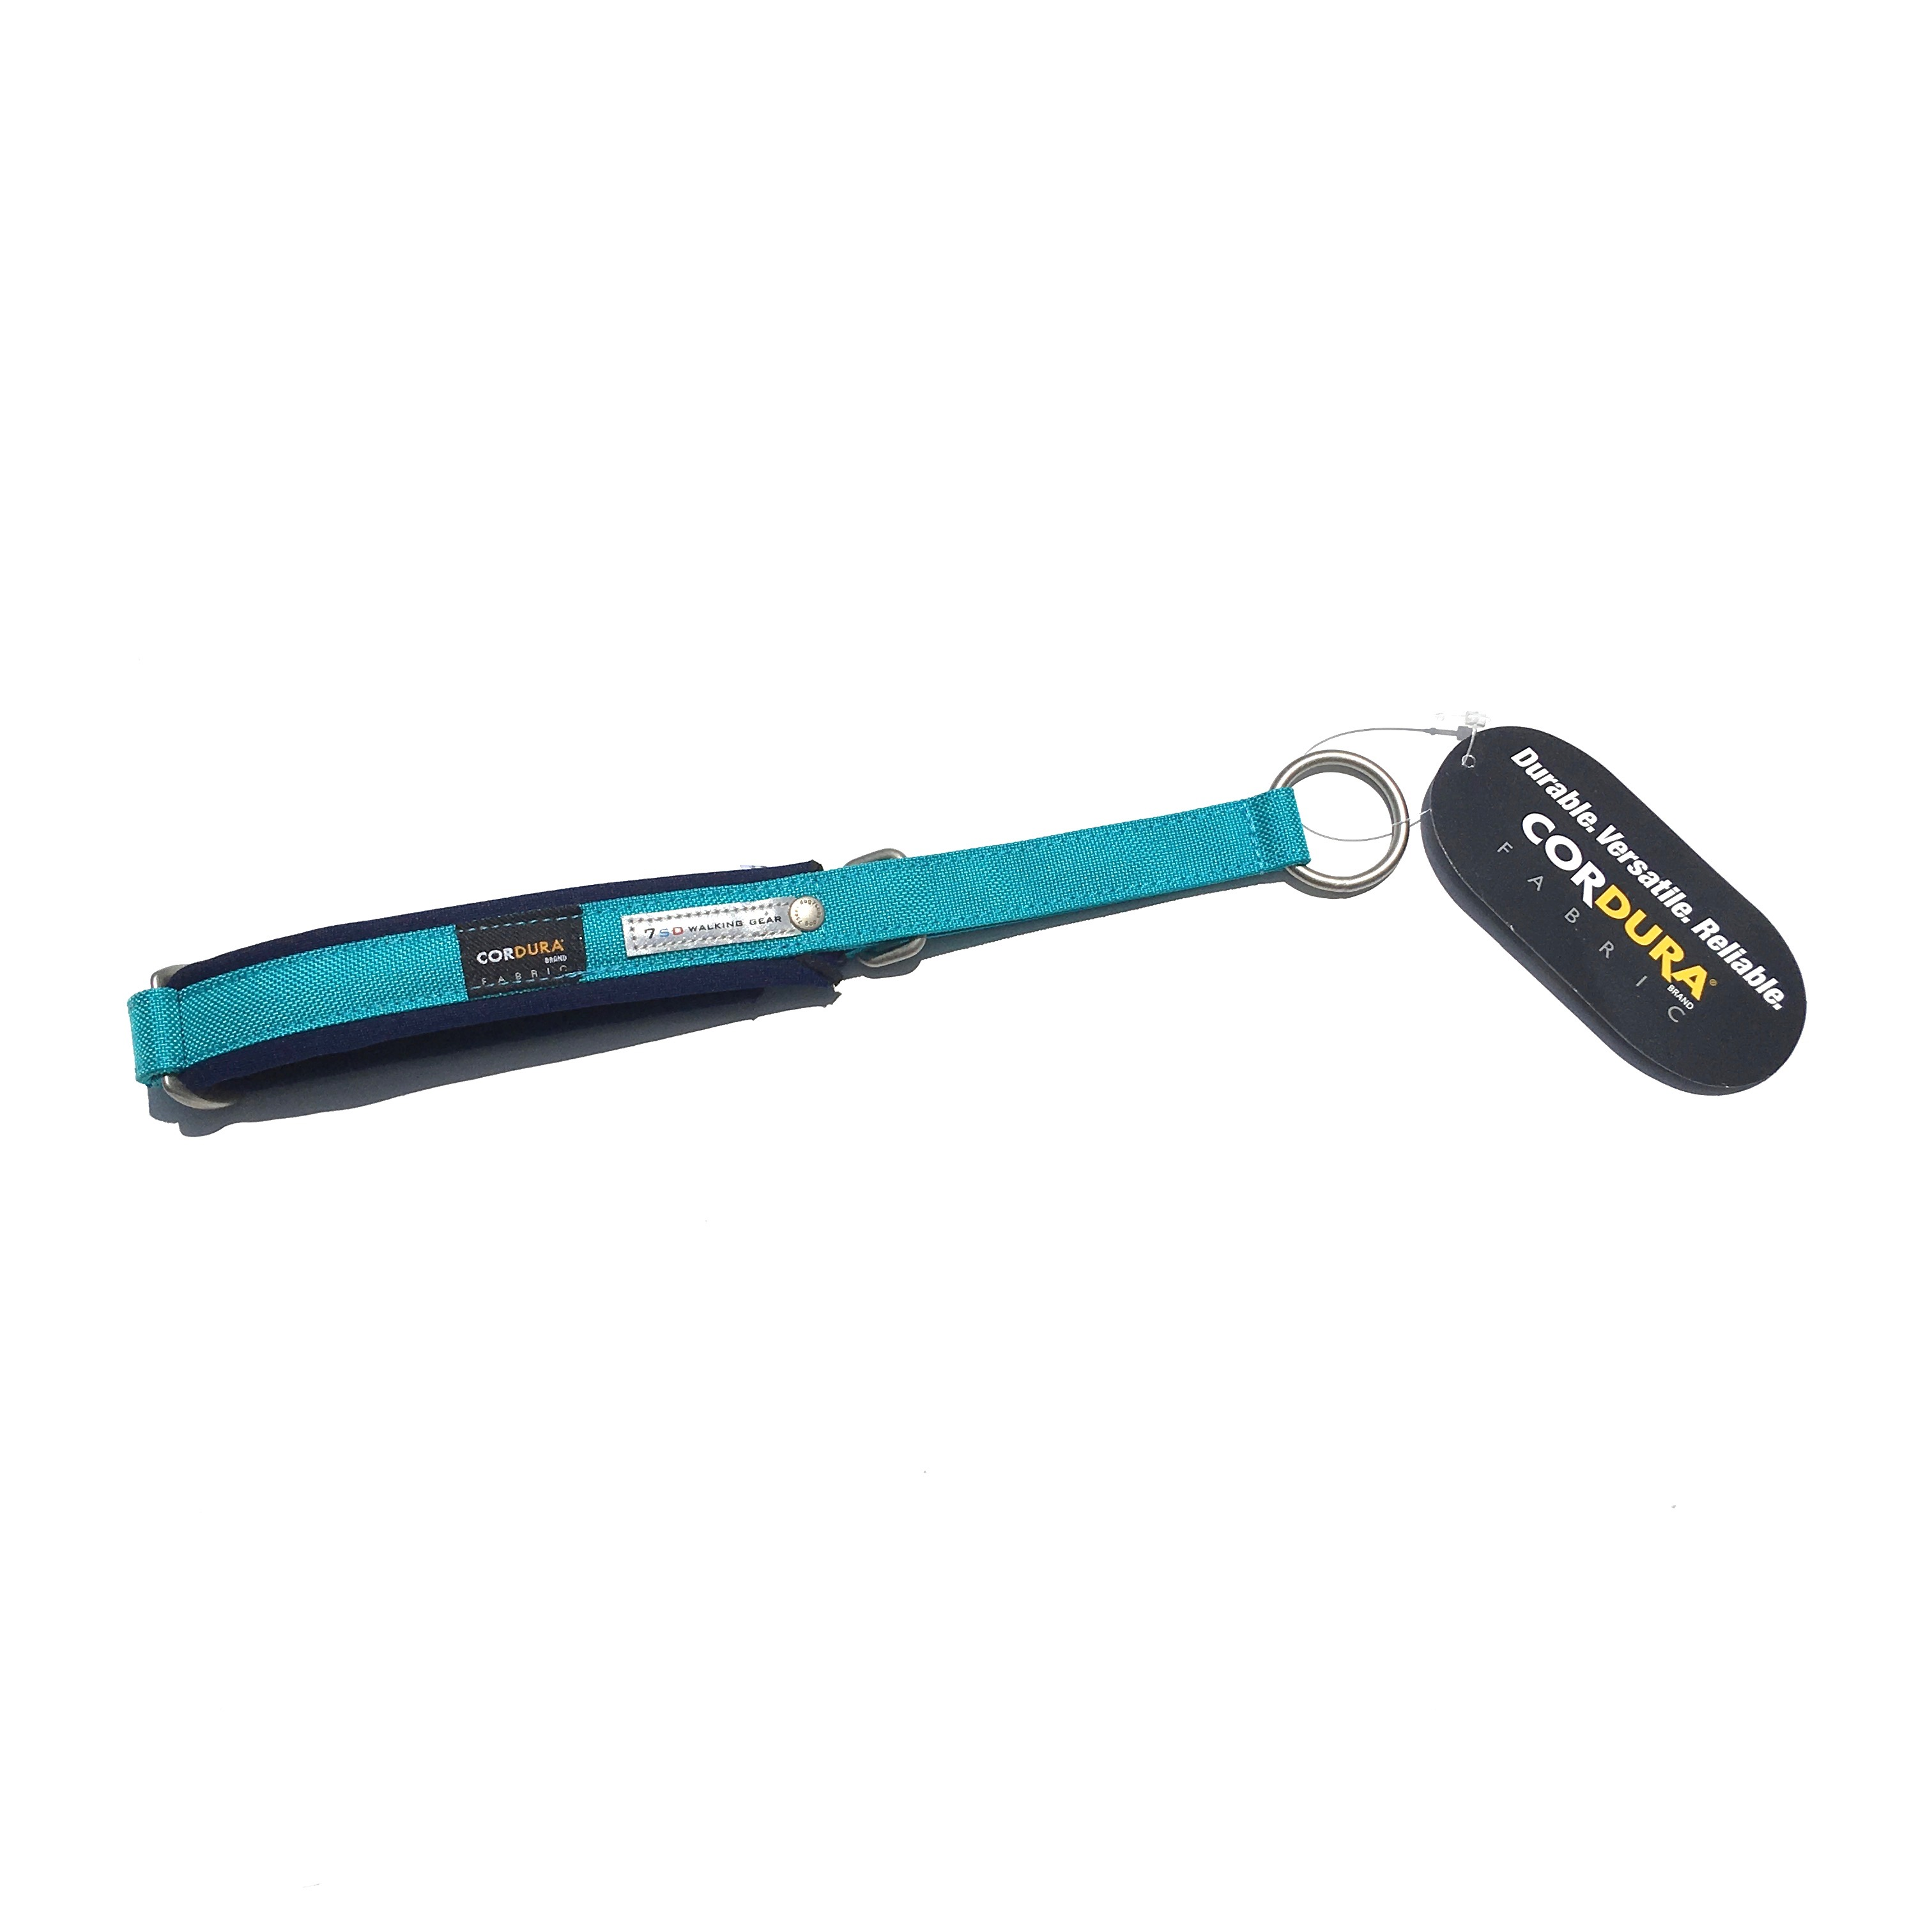 CORDURA SSD  SLIP COLLAR コーデュラ  スリップカラー ブルー_d0217958_13211044.jpg